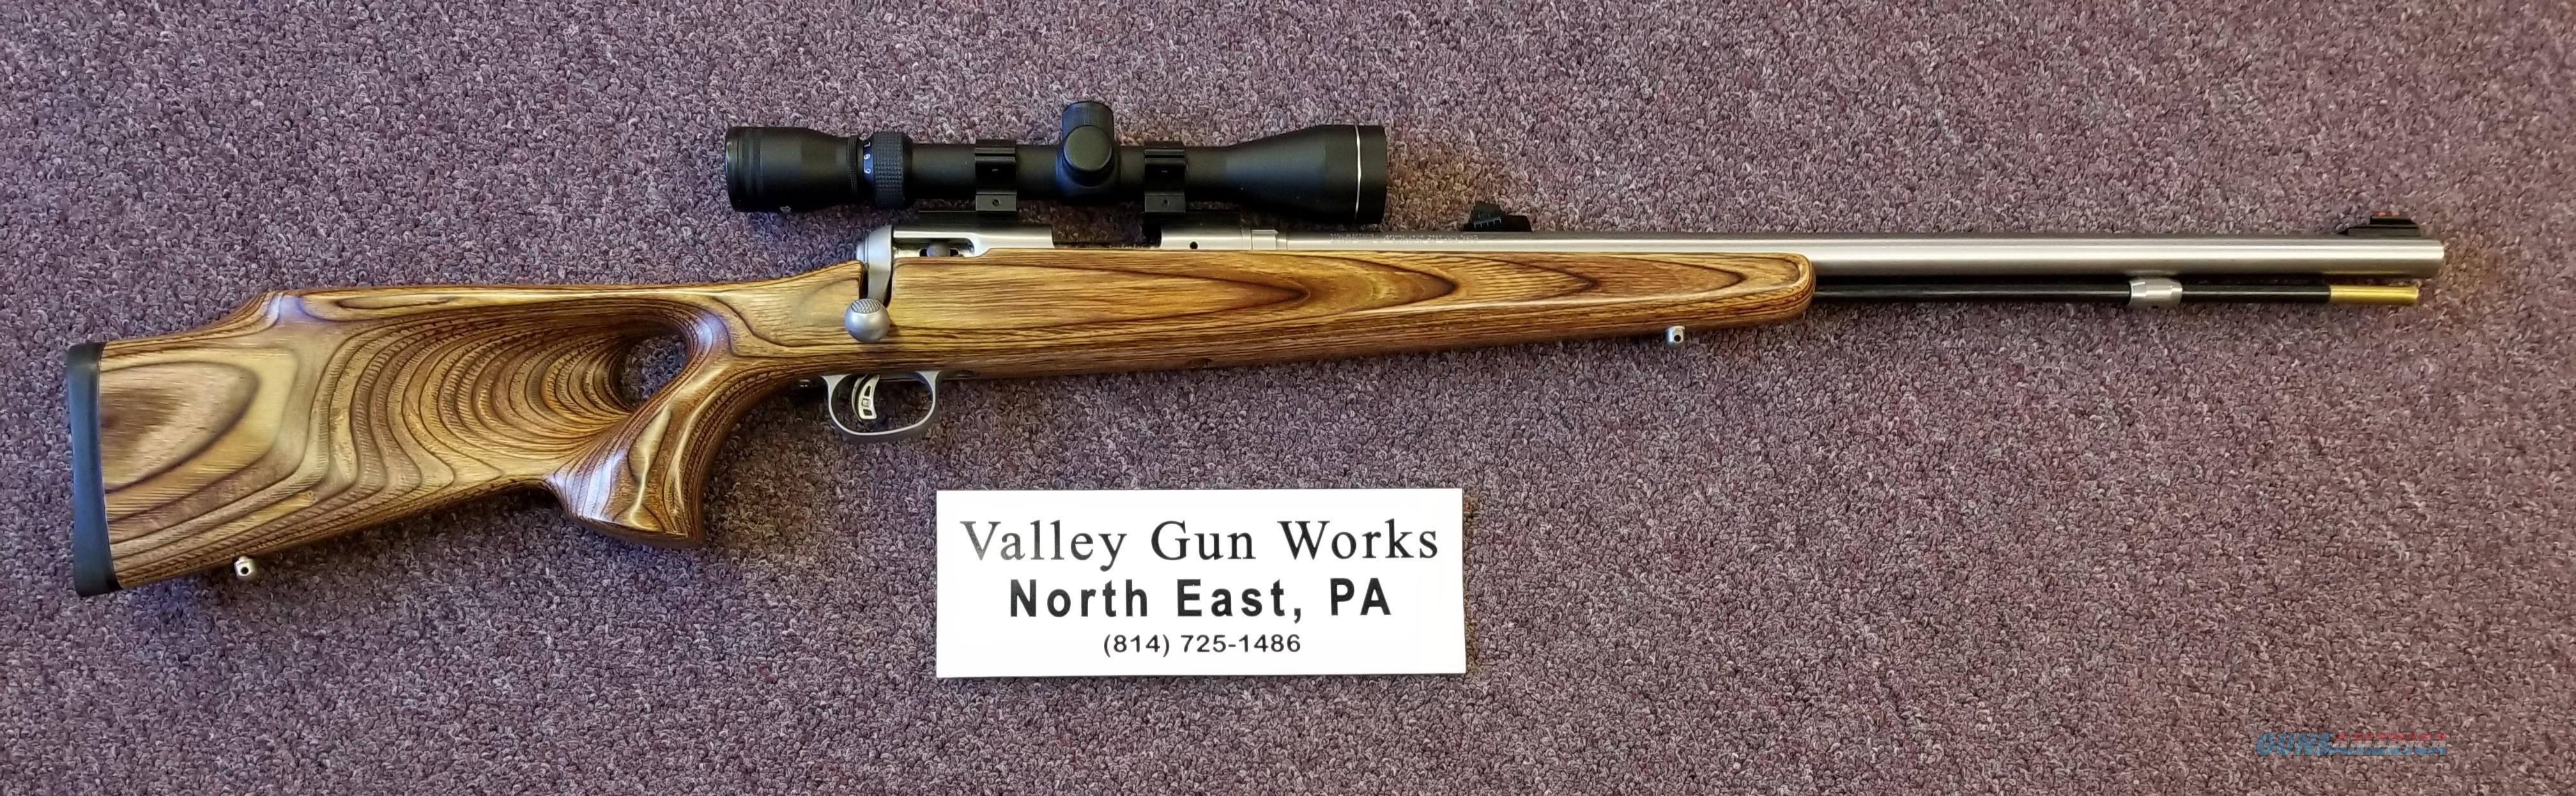 Savage 10MLII - 50 caliber - Muzzle Loader - Optics - Stainless - Free Shipping  Non-Guns > Black Powder Muzzleloading